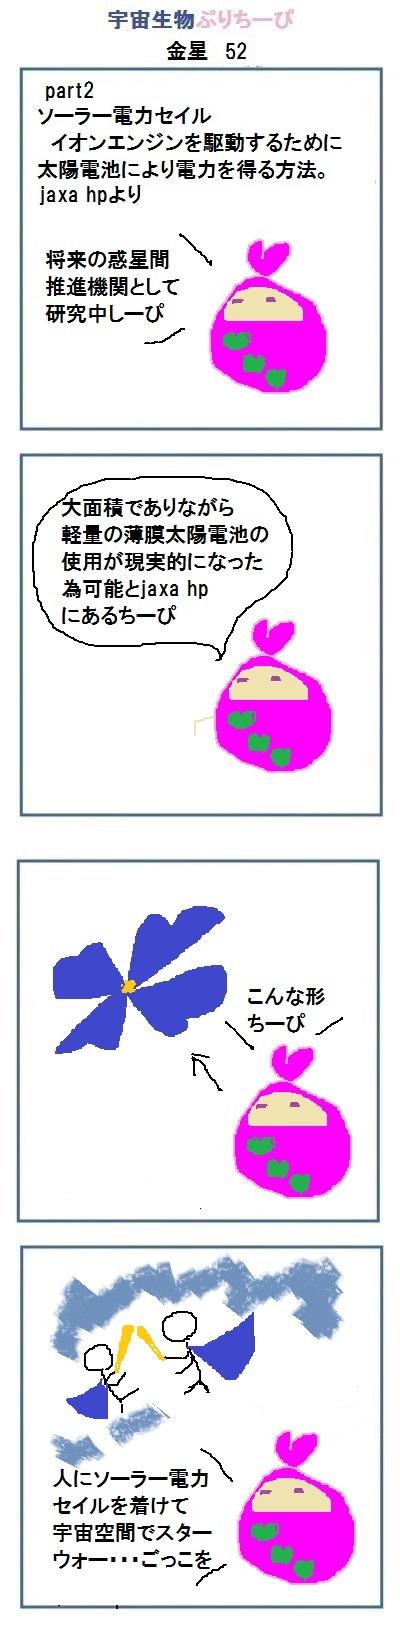 160725_kinsei52.jpg